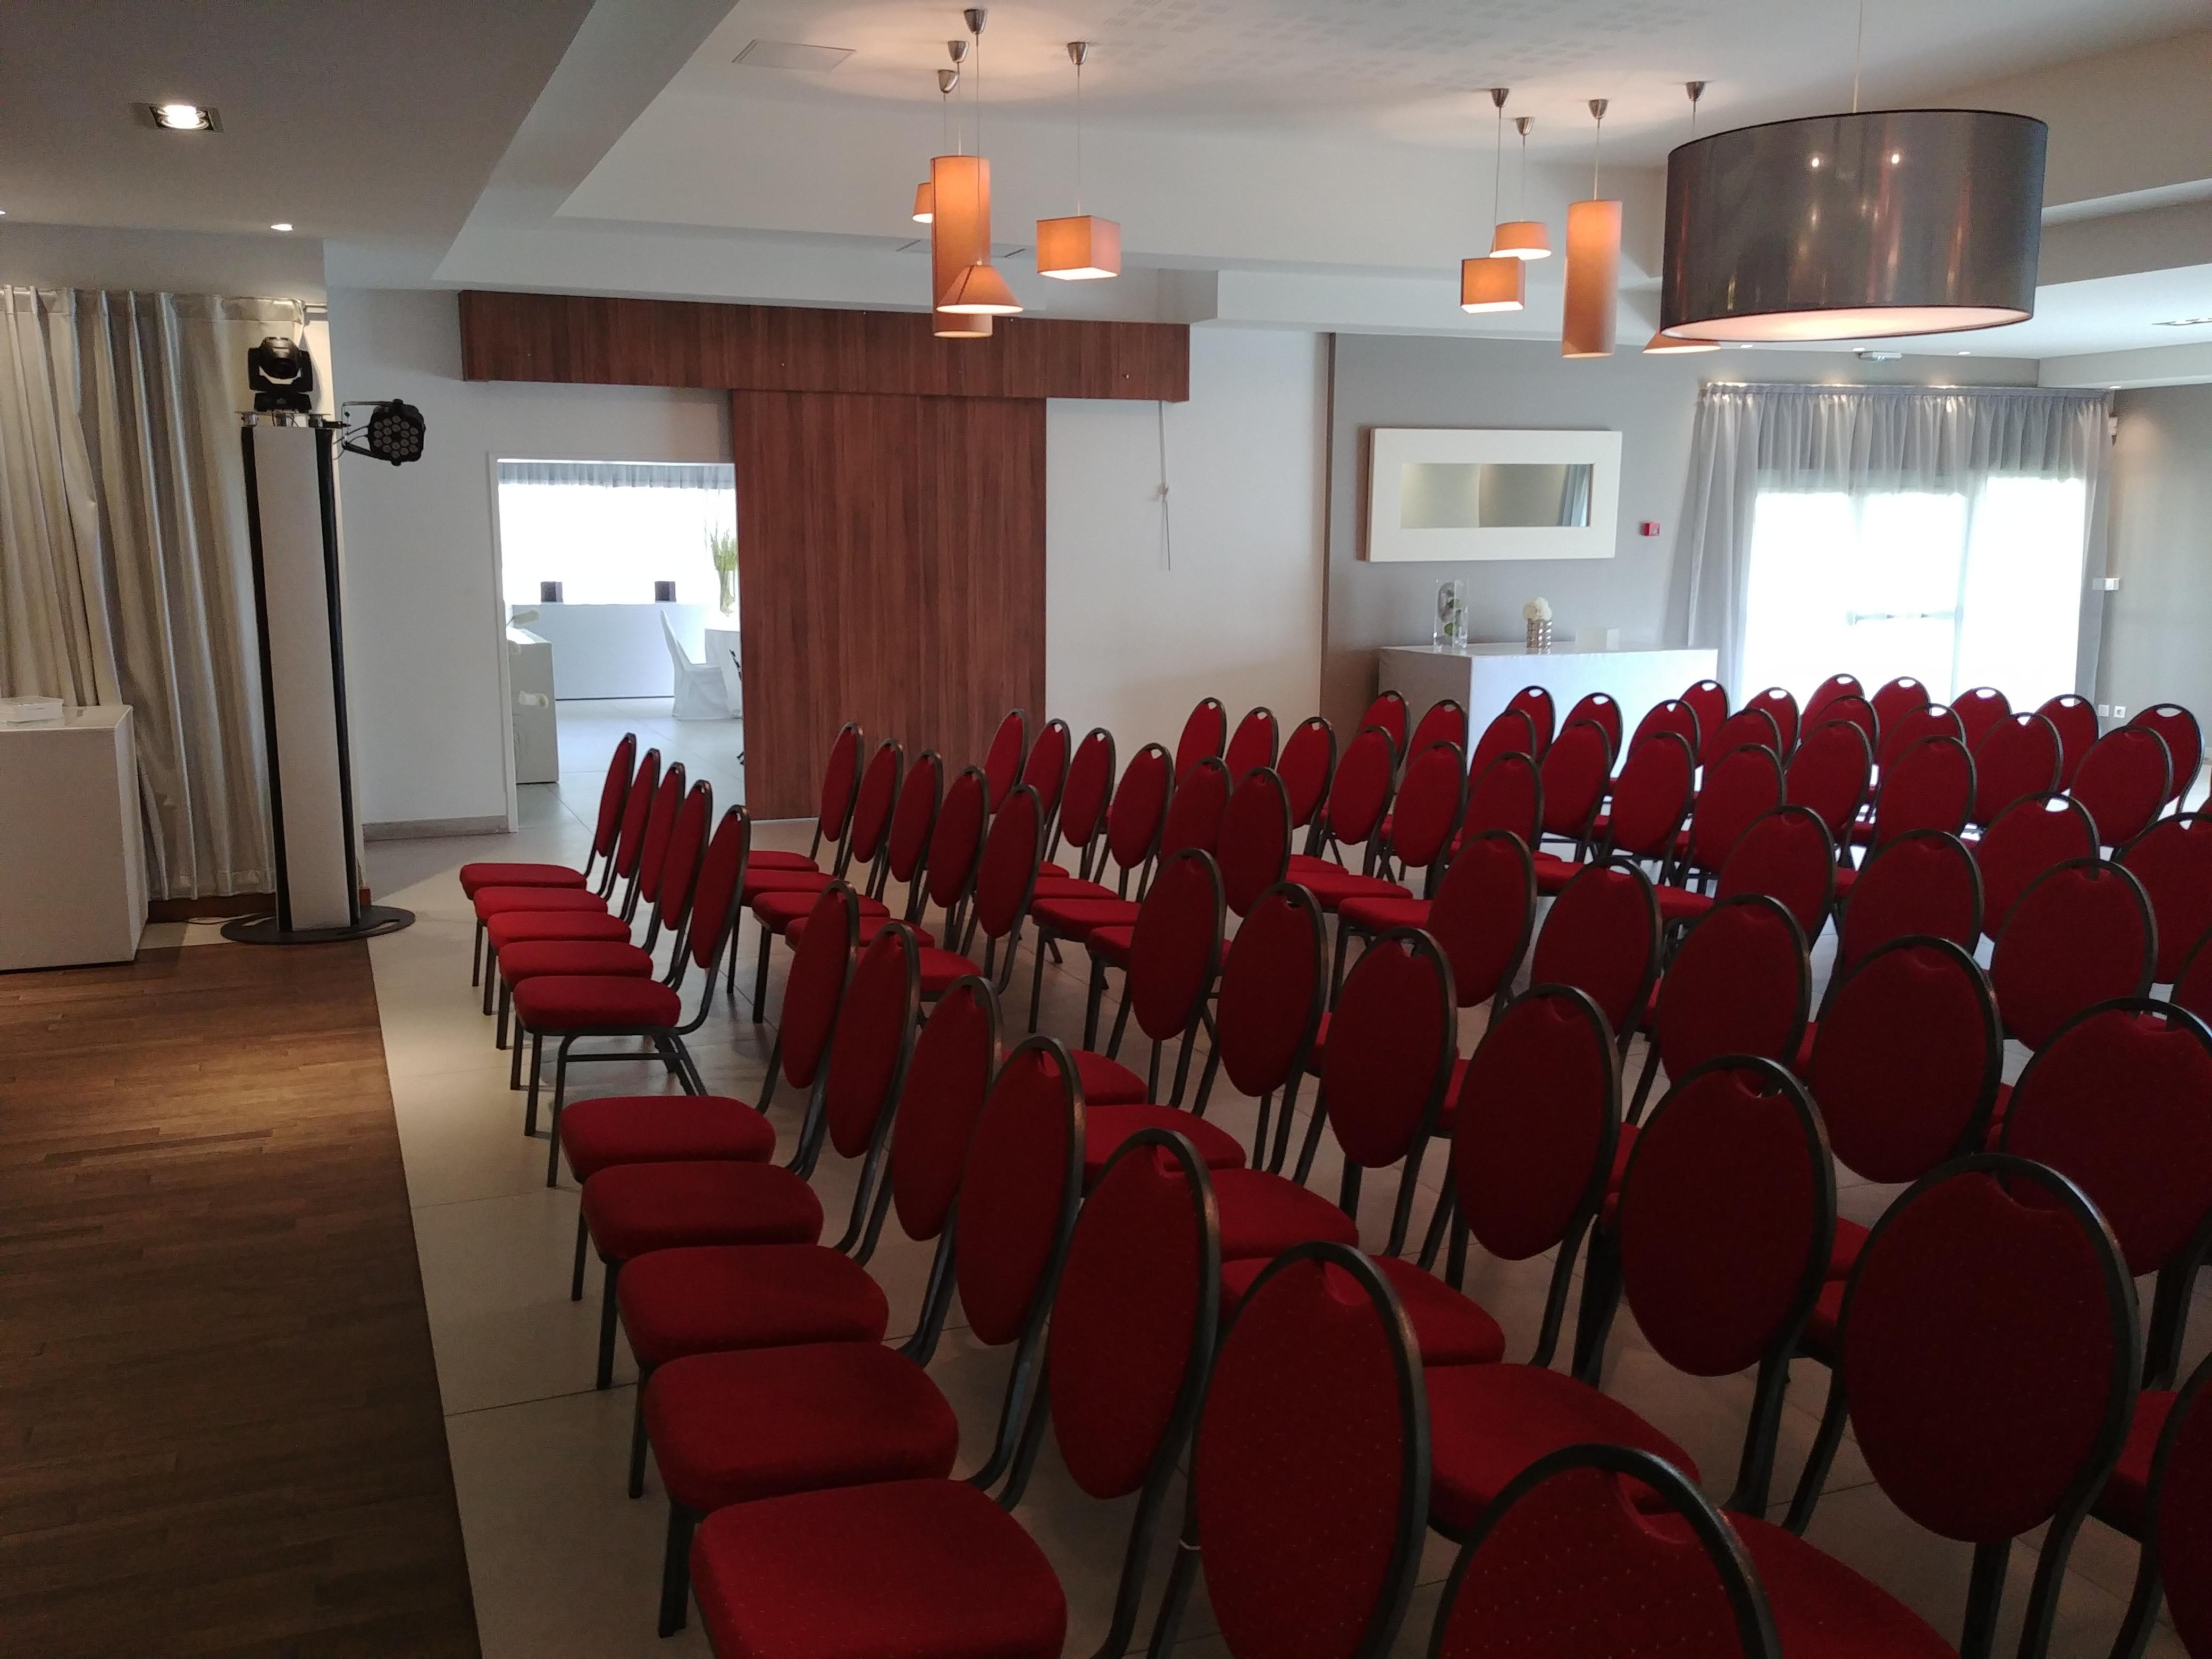 Salle De Reception Allauch Les Salons De La Bauquiere